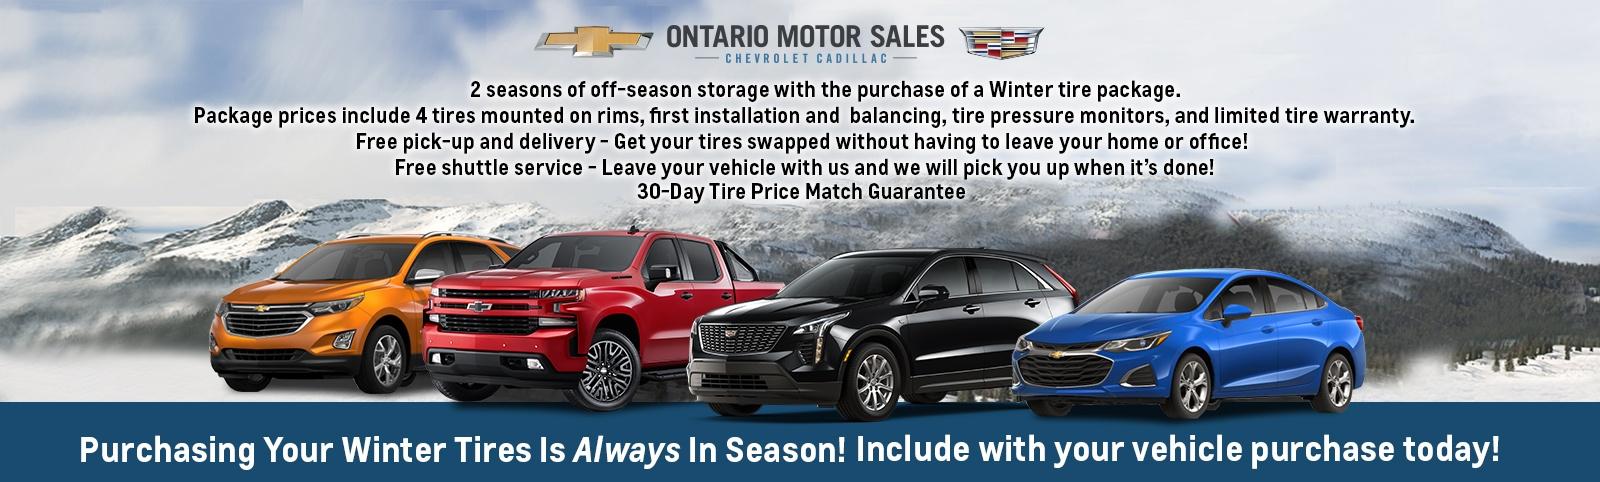 Winter Tire Offer Header1